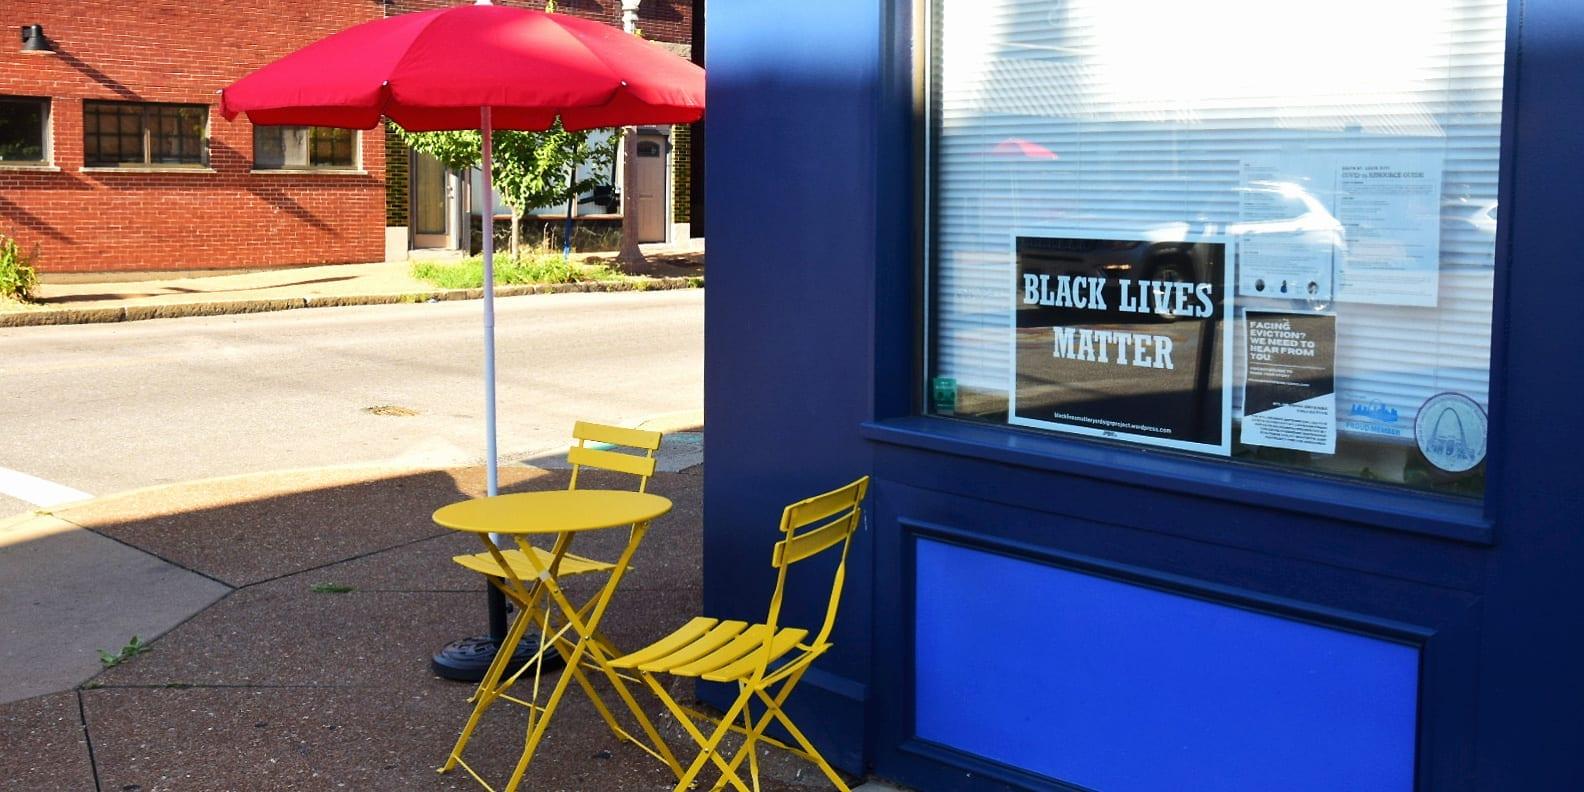 New sidewalk furniture in front of Dutchtown South Community Corporation on Meramec Street in Downtown Dutchtown.